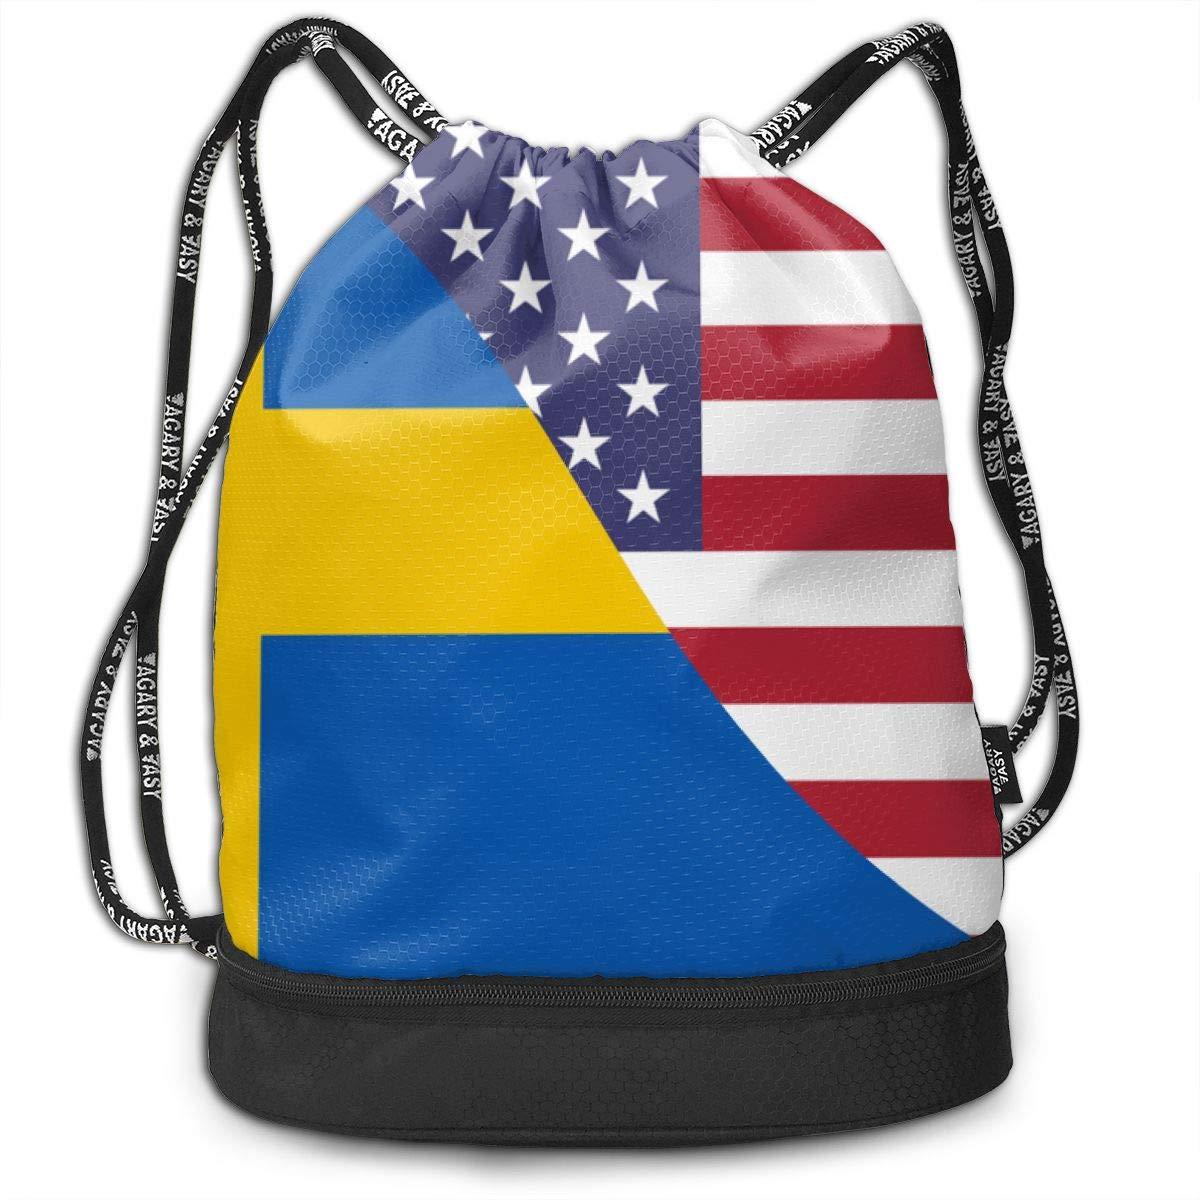 Swedish USA Friendship Flag Drawstring Bag Multifunctional String Backpack Custom Cinch Backpack Sport Gym Sack